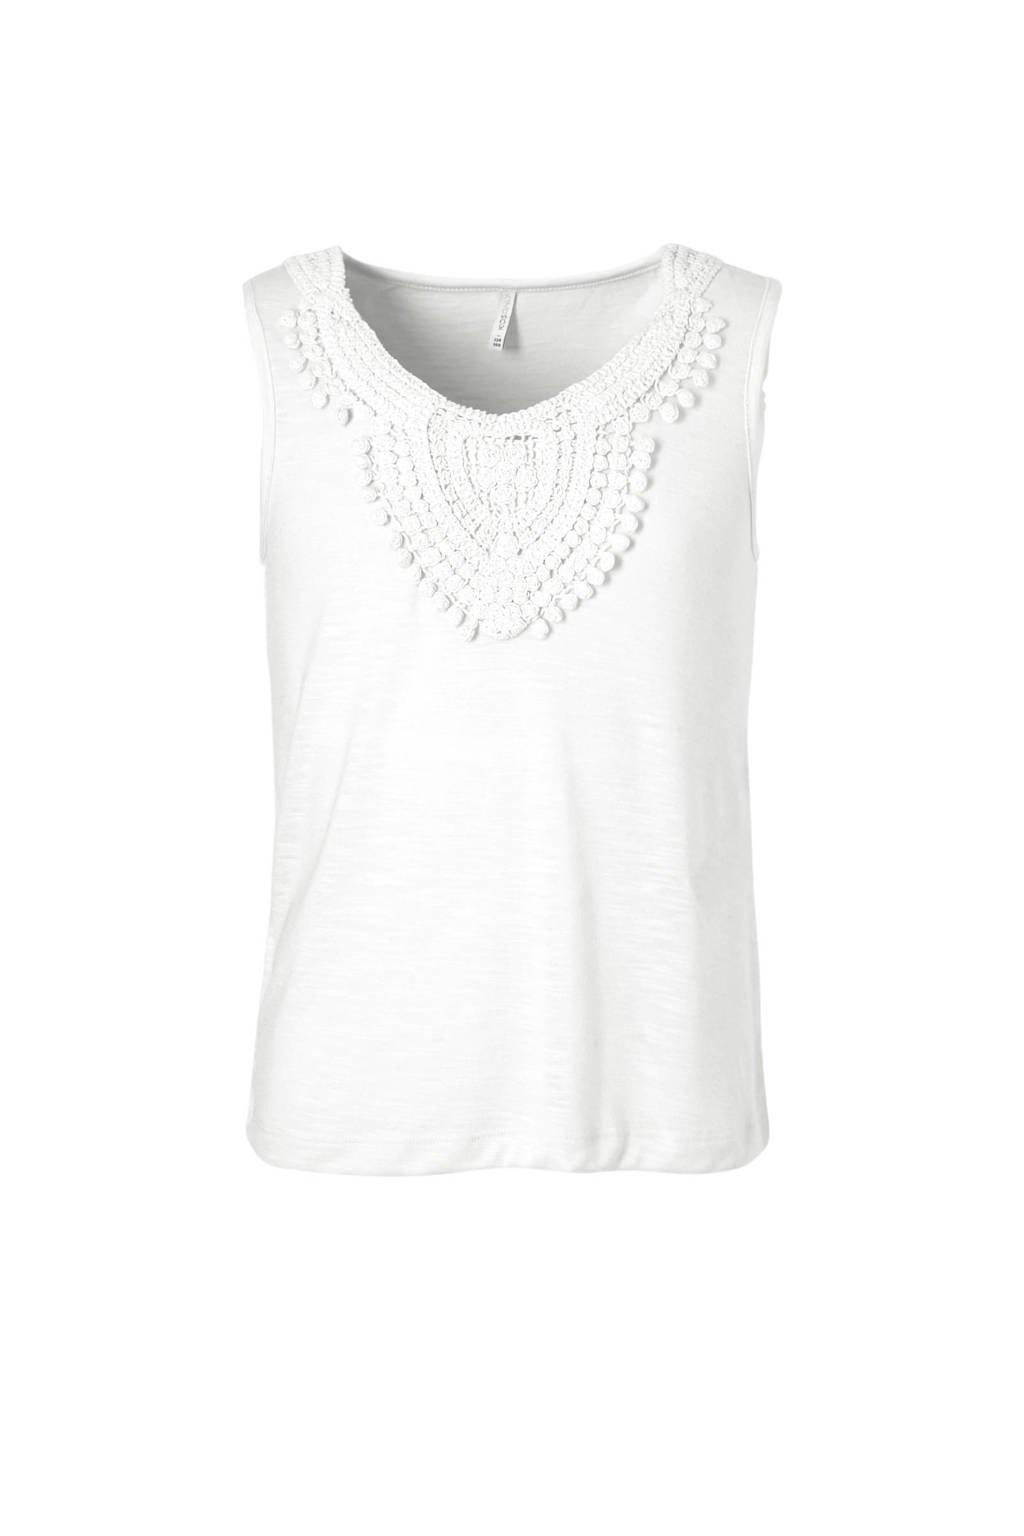 KIDSONLY mouwloze top Isa met borduursels wit, Wit